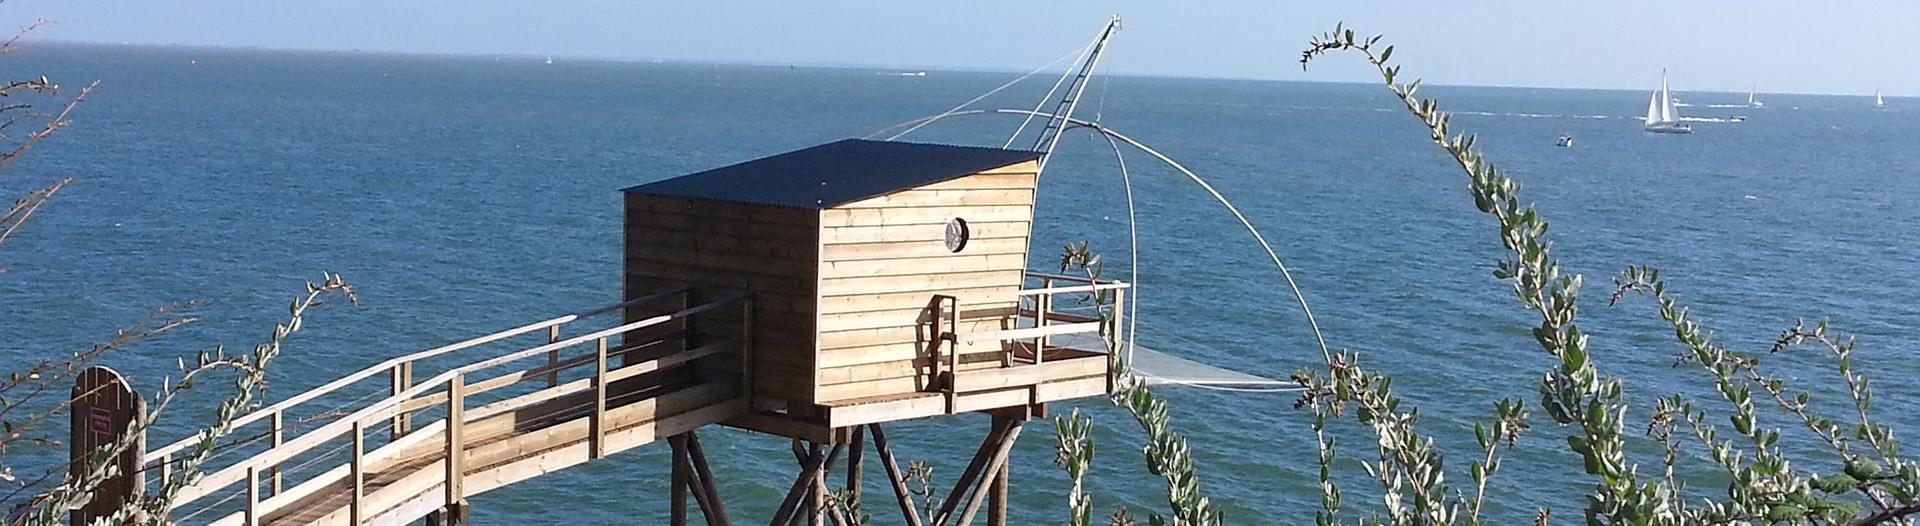 slider-region-loire-atlantique-carrelet